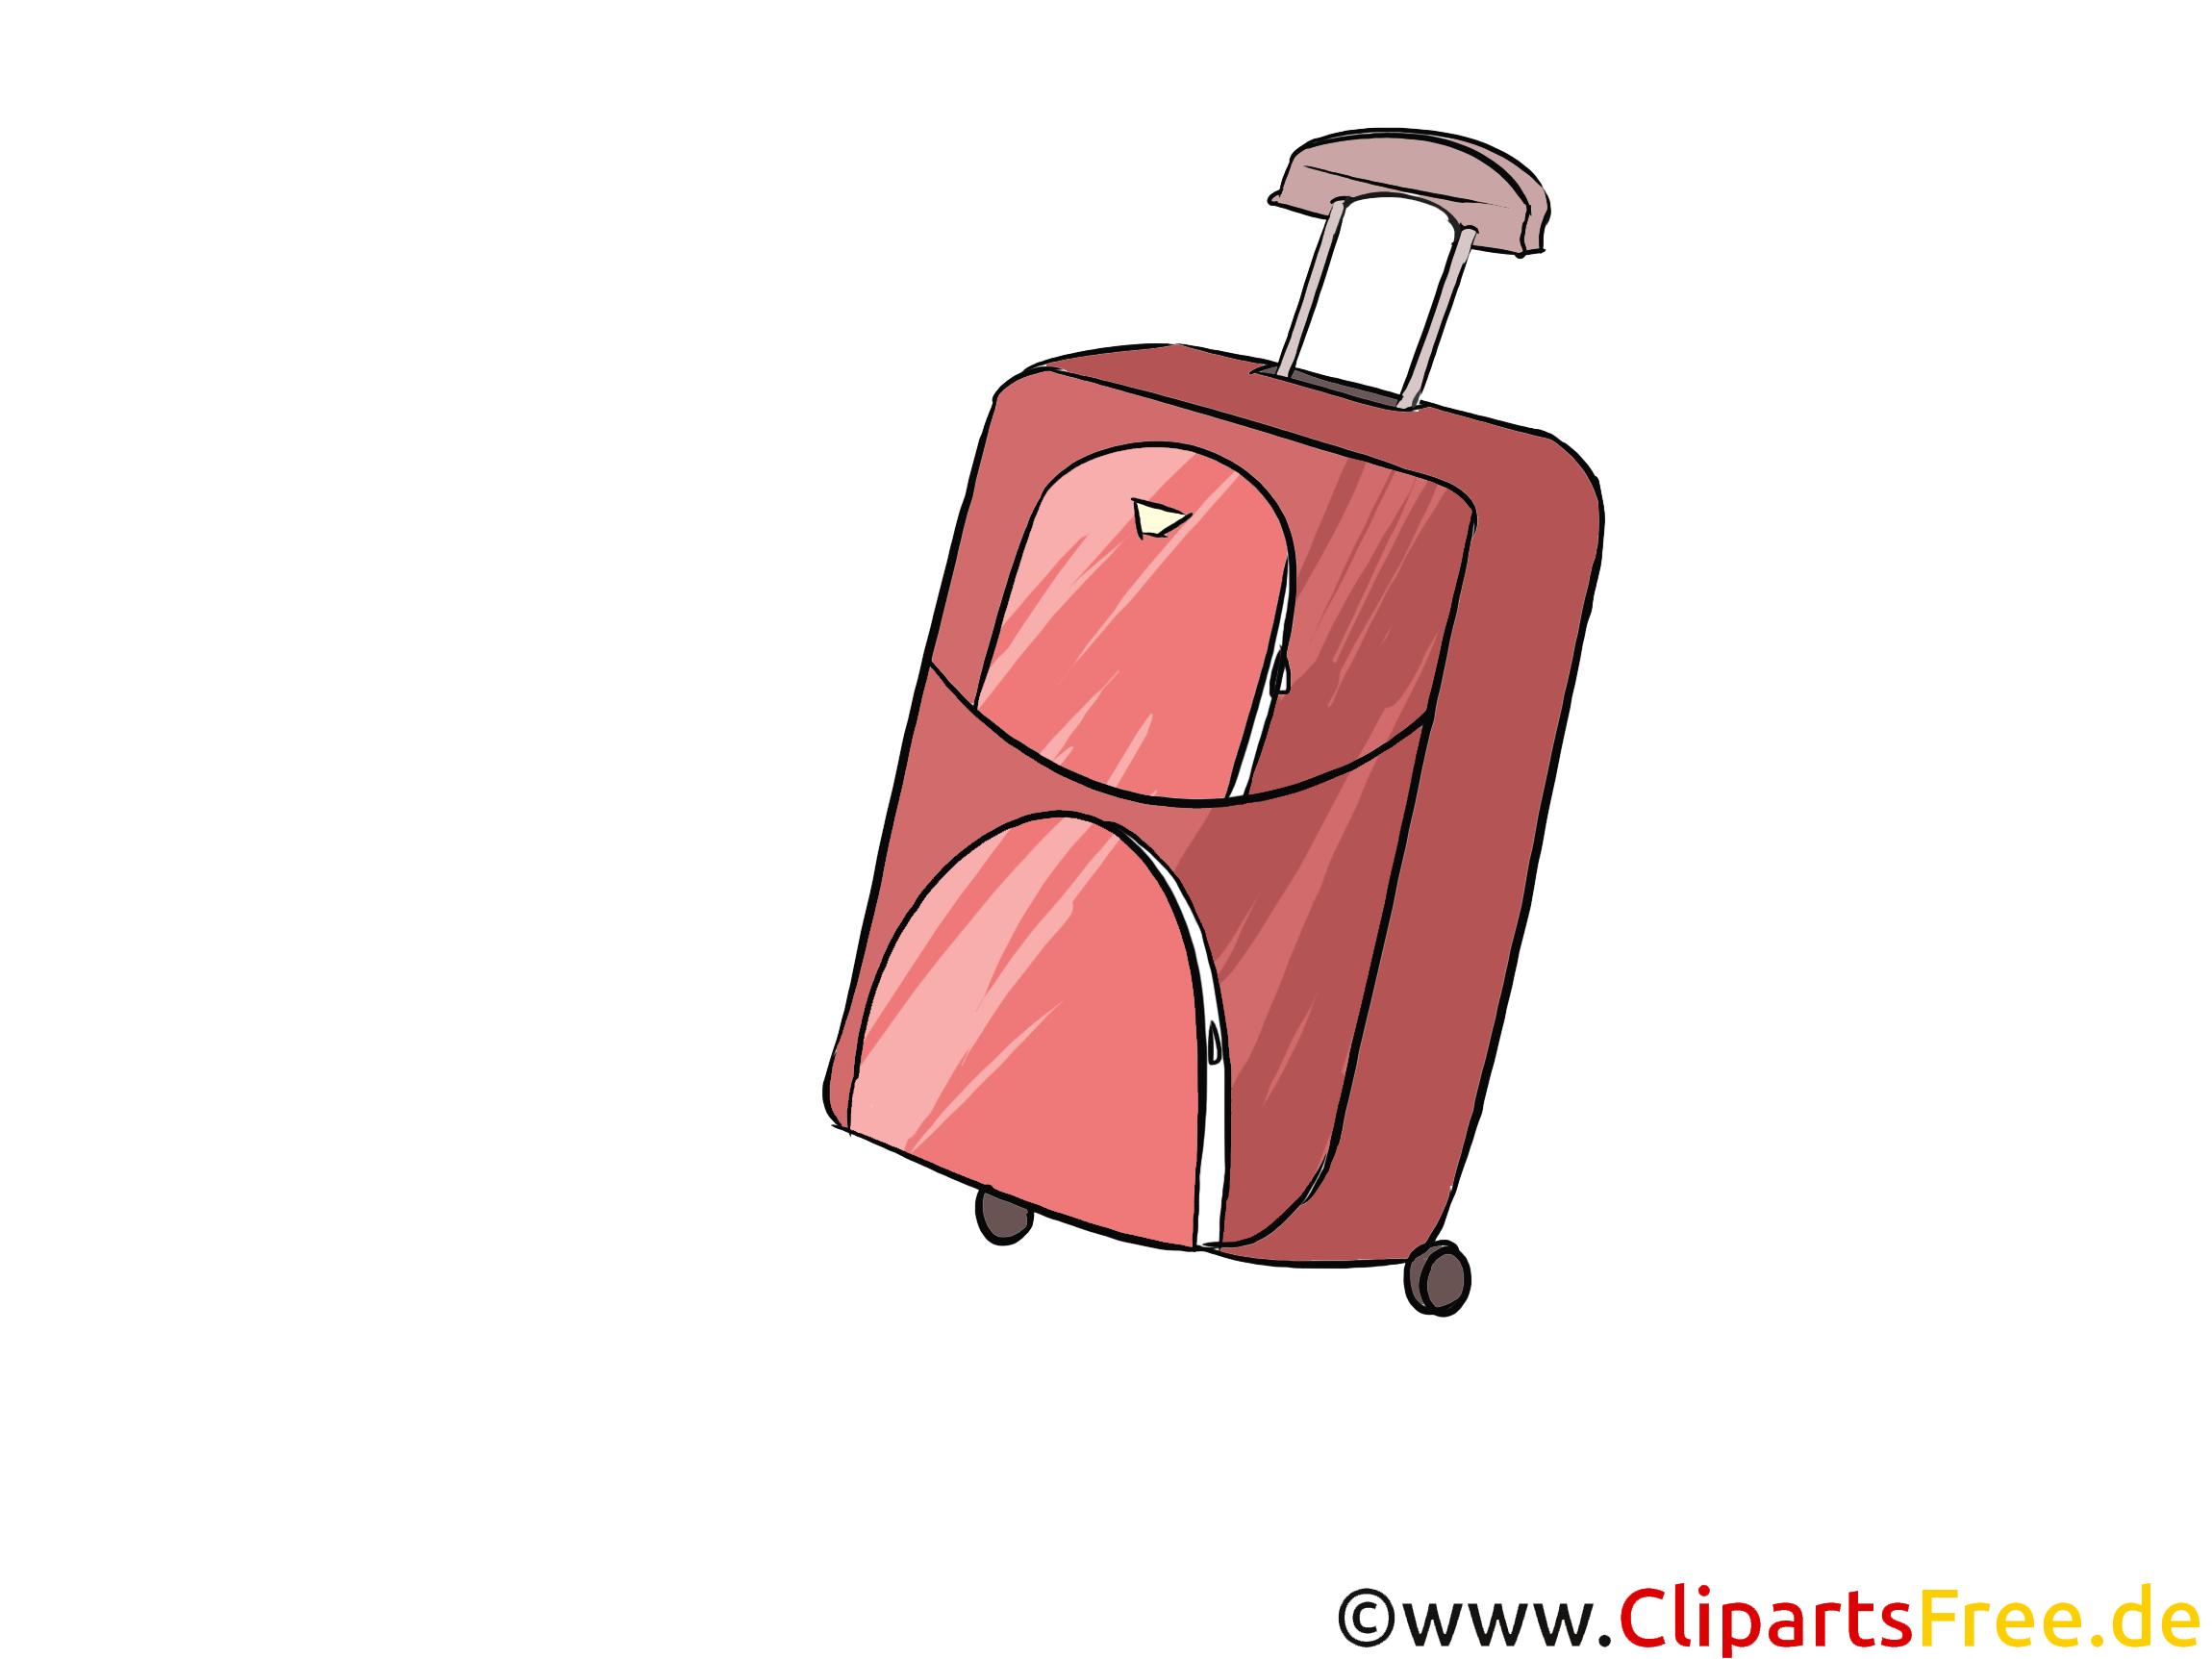 Koffer mit Rädern Bild, Illustration, Clipart